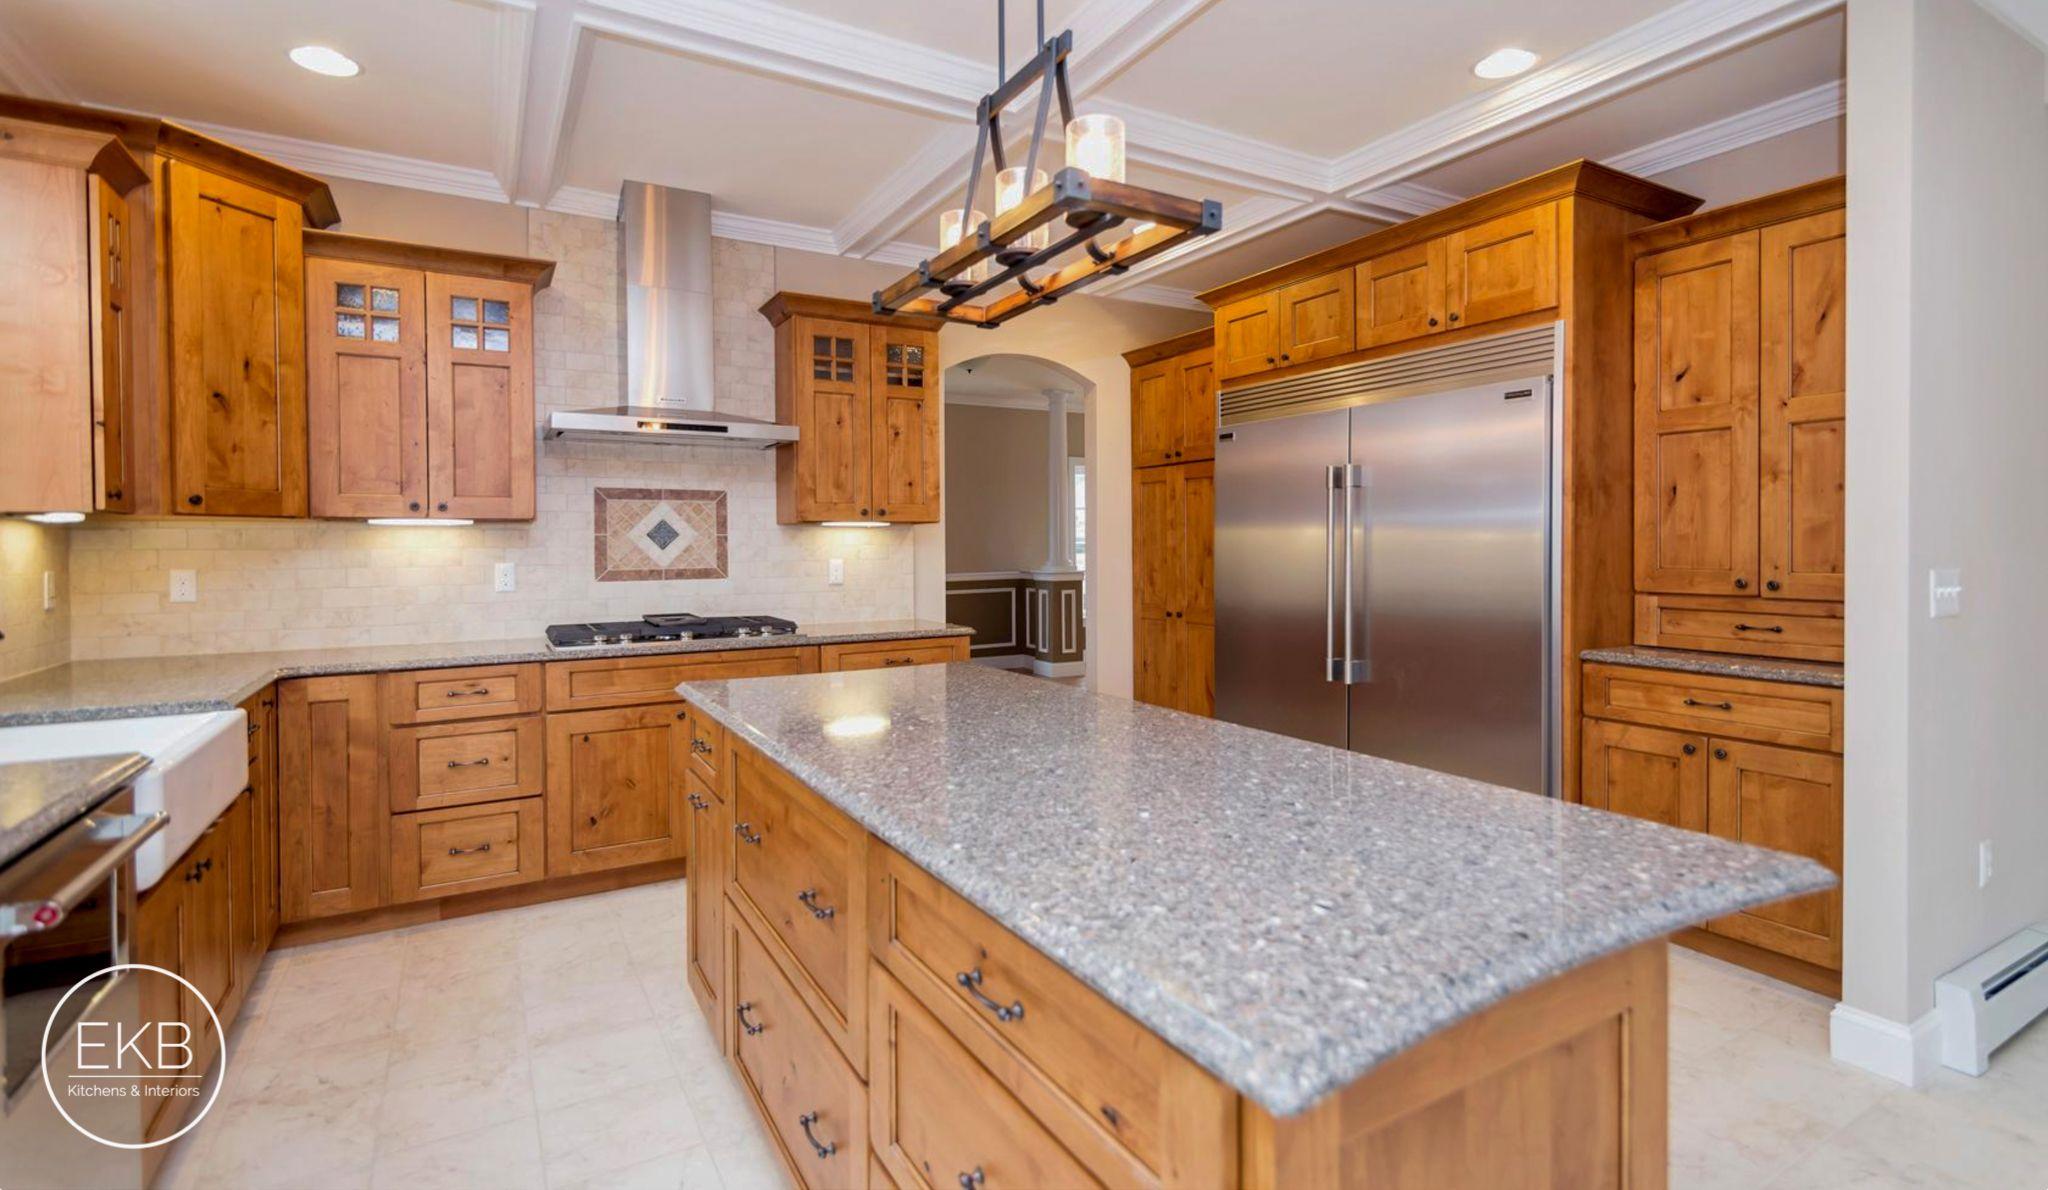 Elegant Glazed Knotty Alder Cabinets